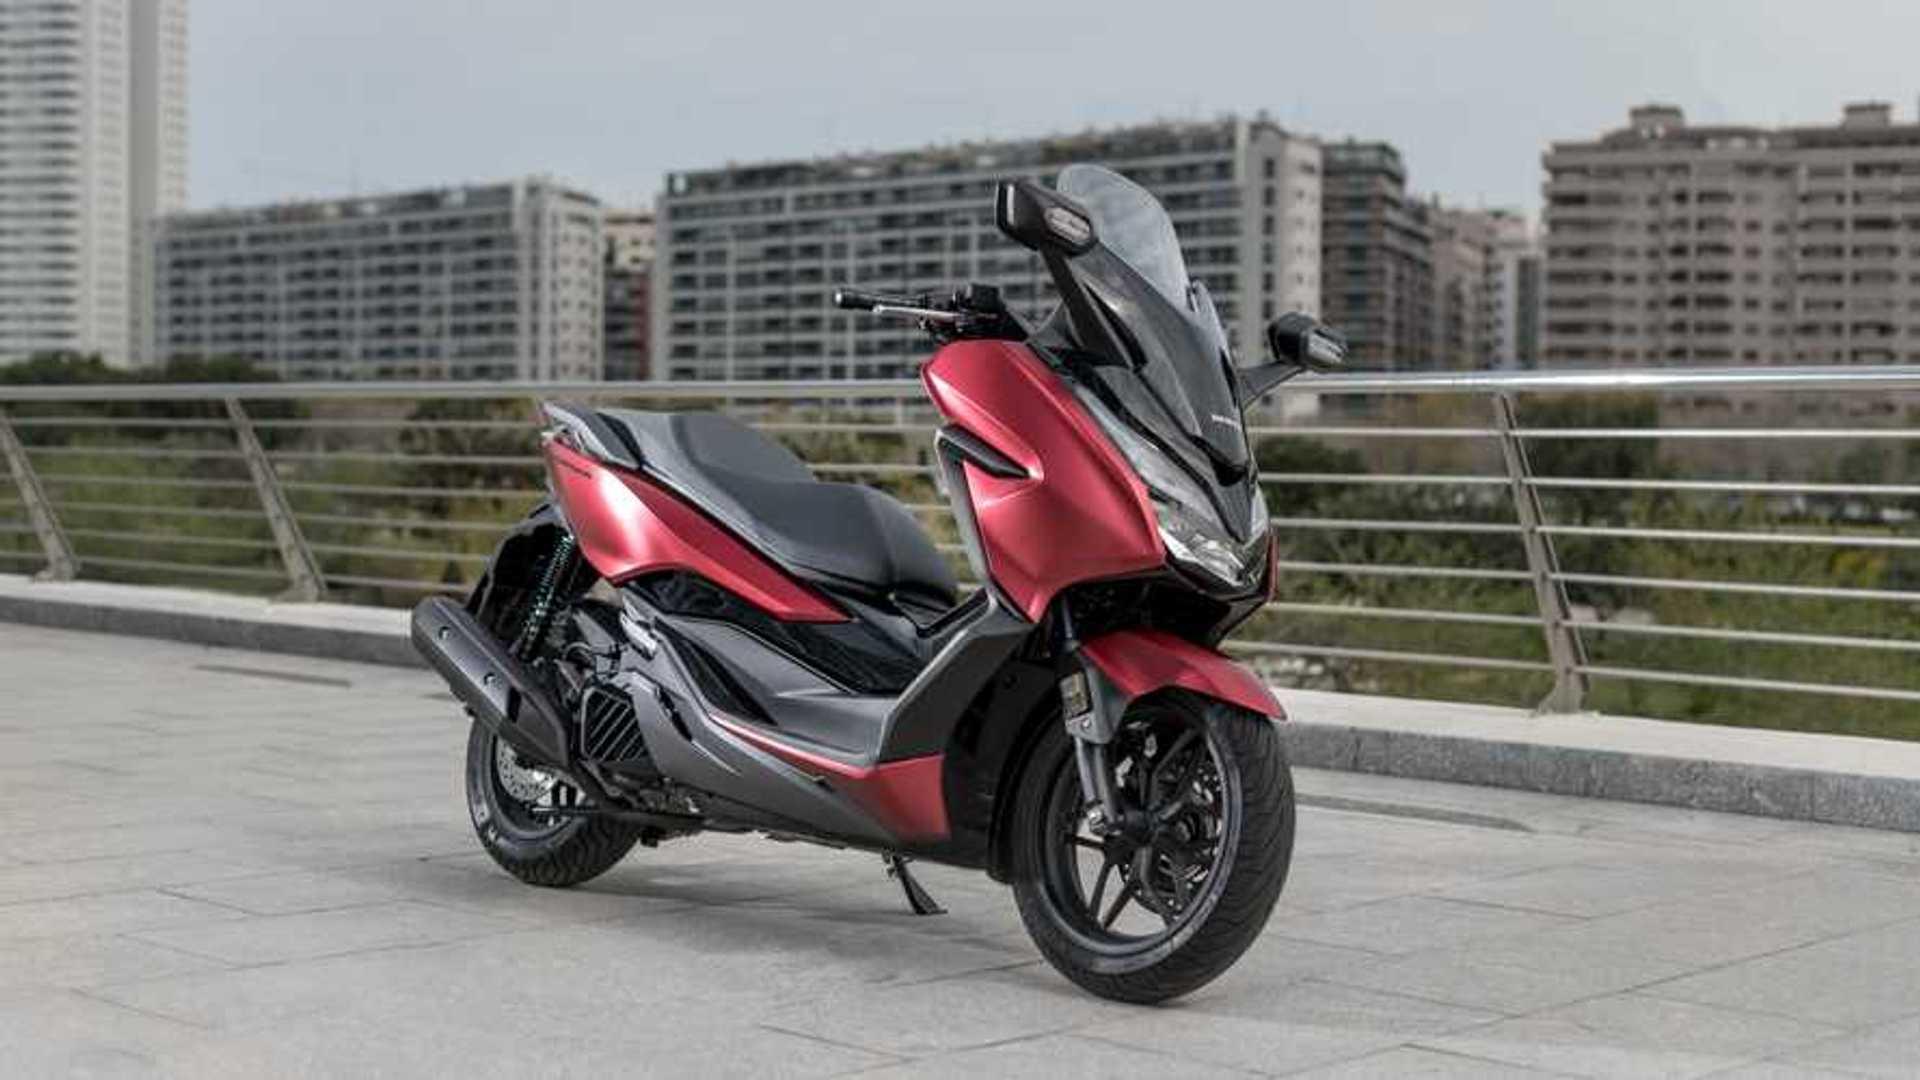 Essai Honda Forza 125 Et 300 Toujours Plus Haut